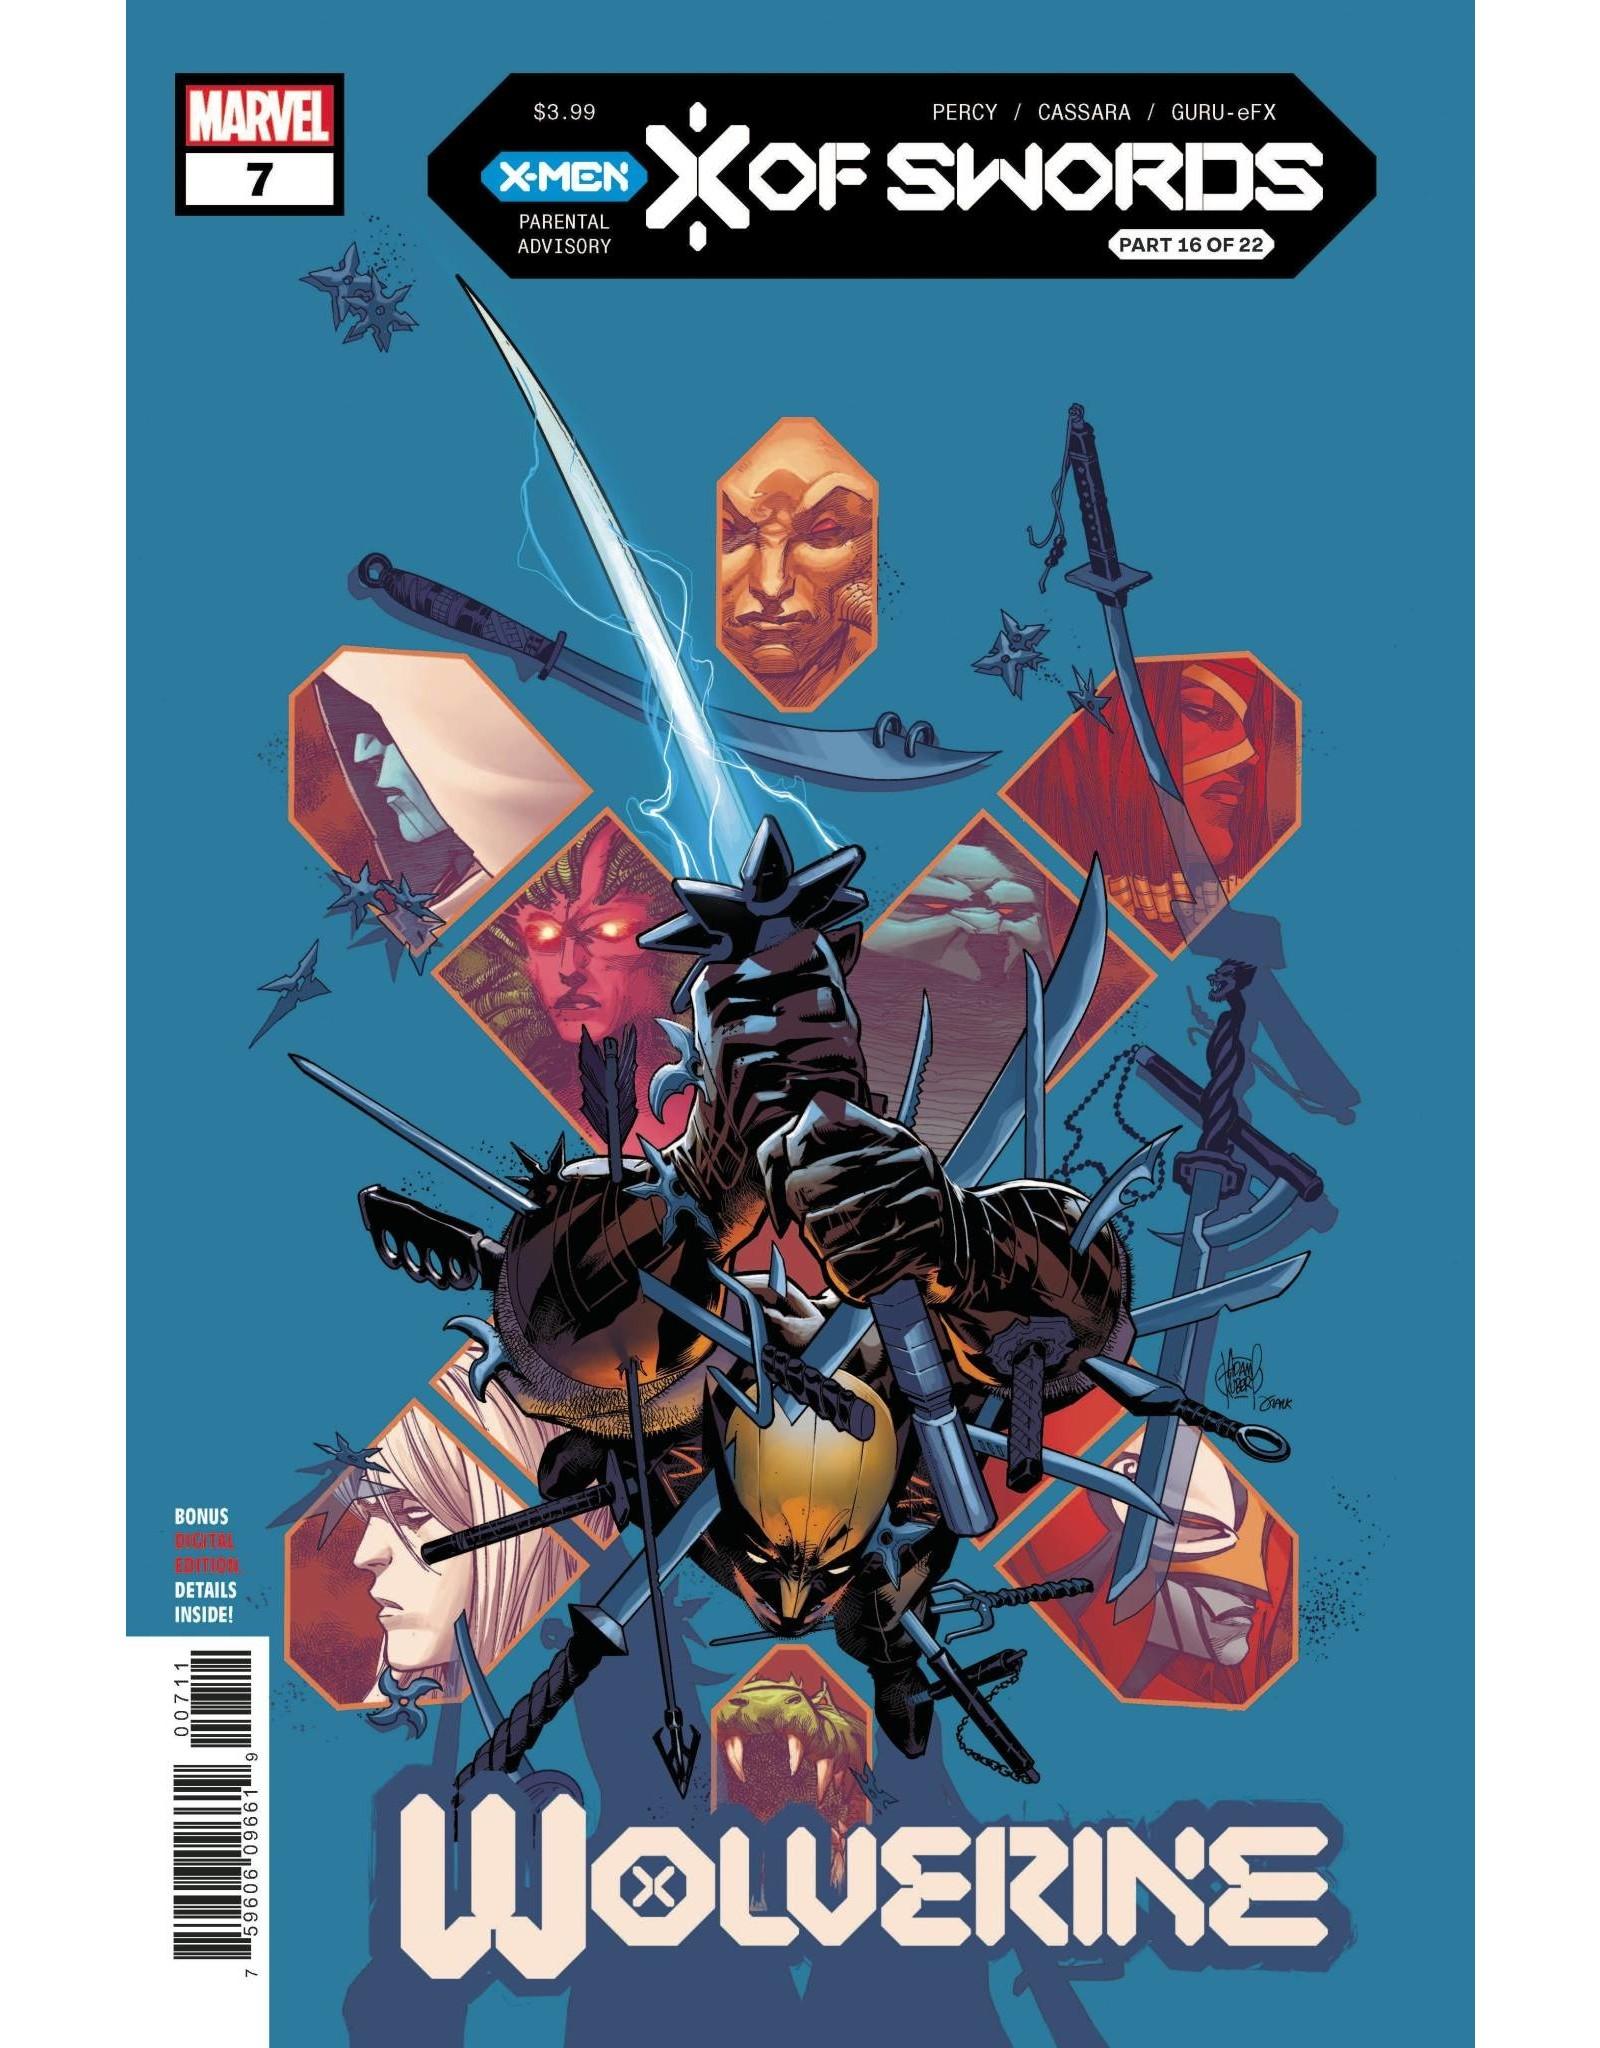 Marvel Comics WOLVERINE #7 XOS